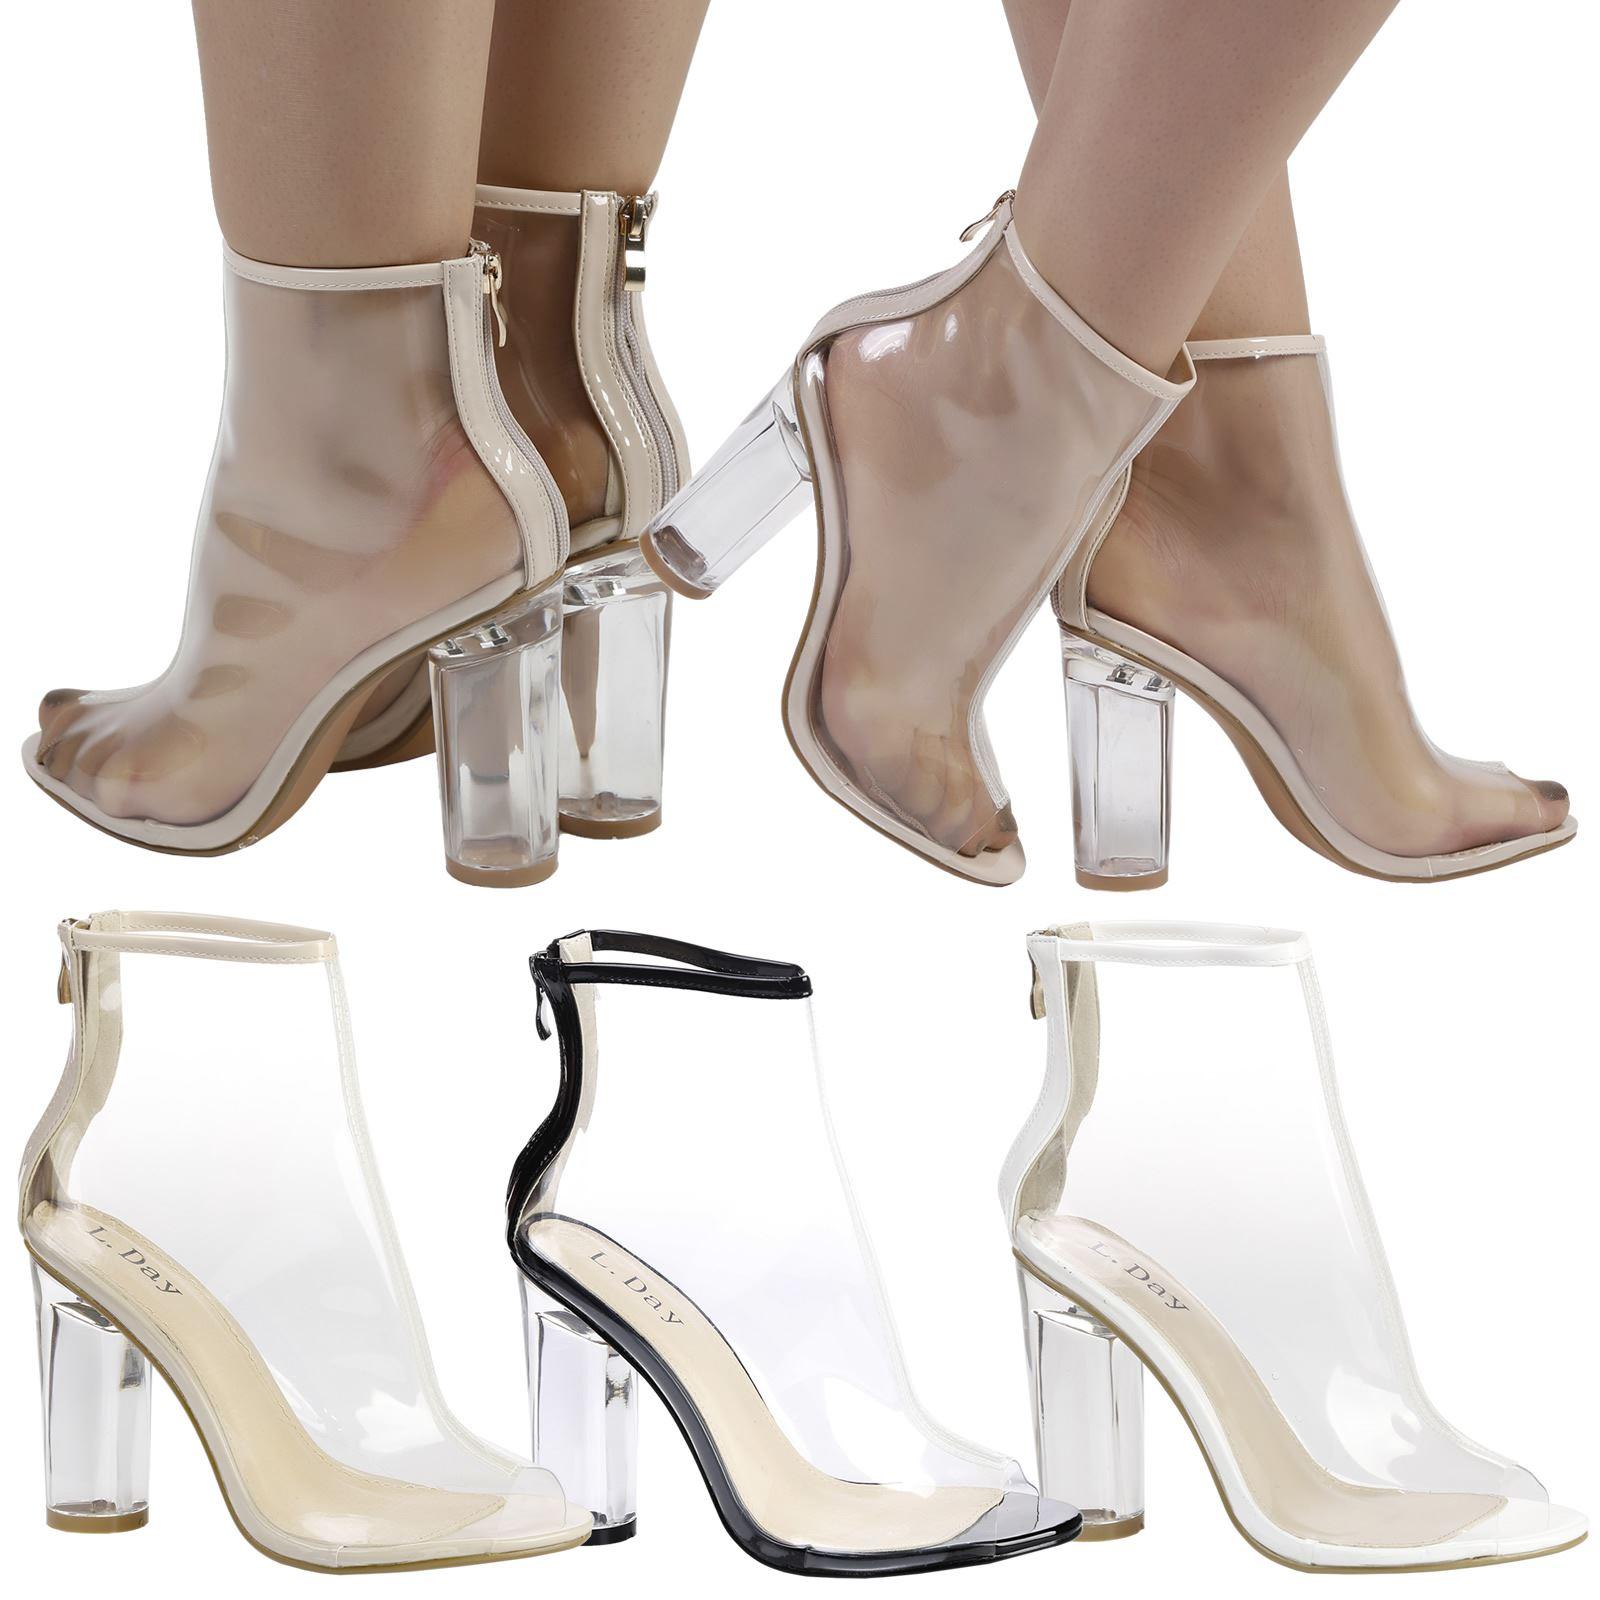 S387 - Ladies Perspex Clear Peep Toe High Heeled Ankle Boots - UK 3-8